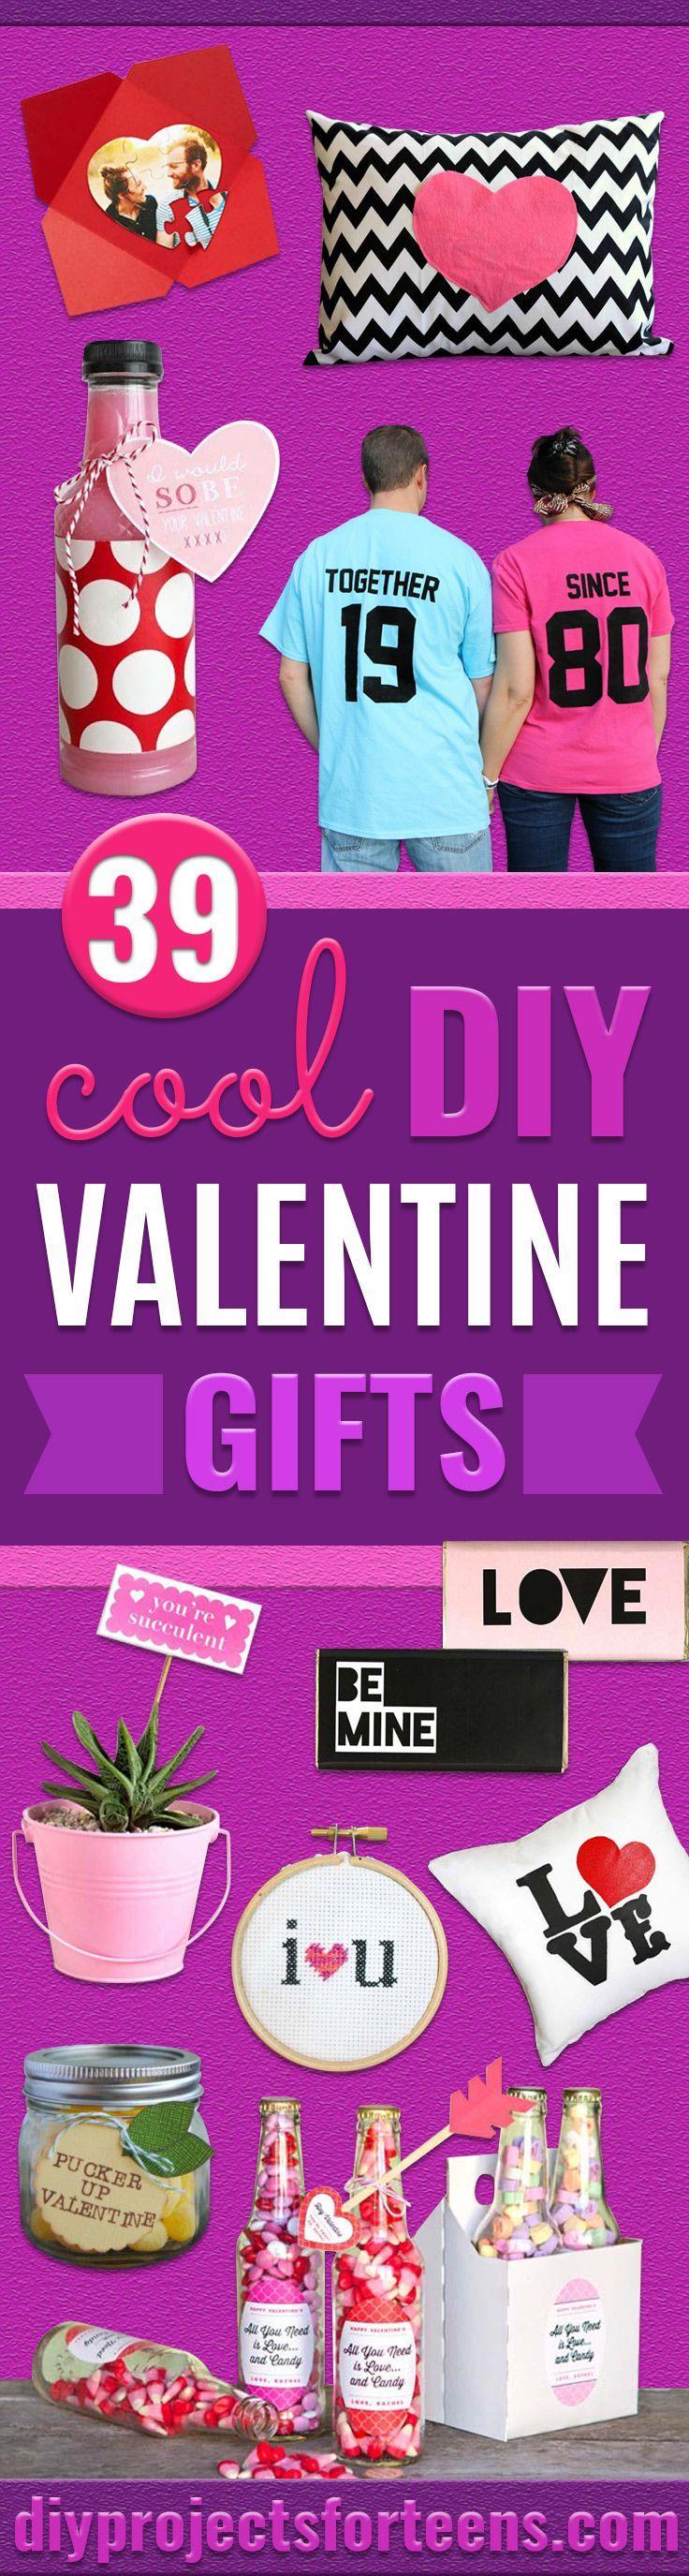 39 cool diy valentine gifts